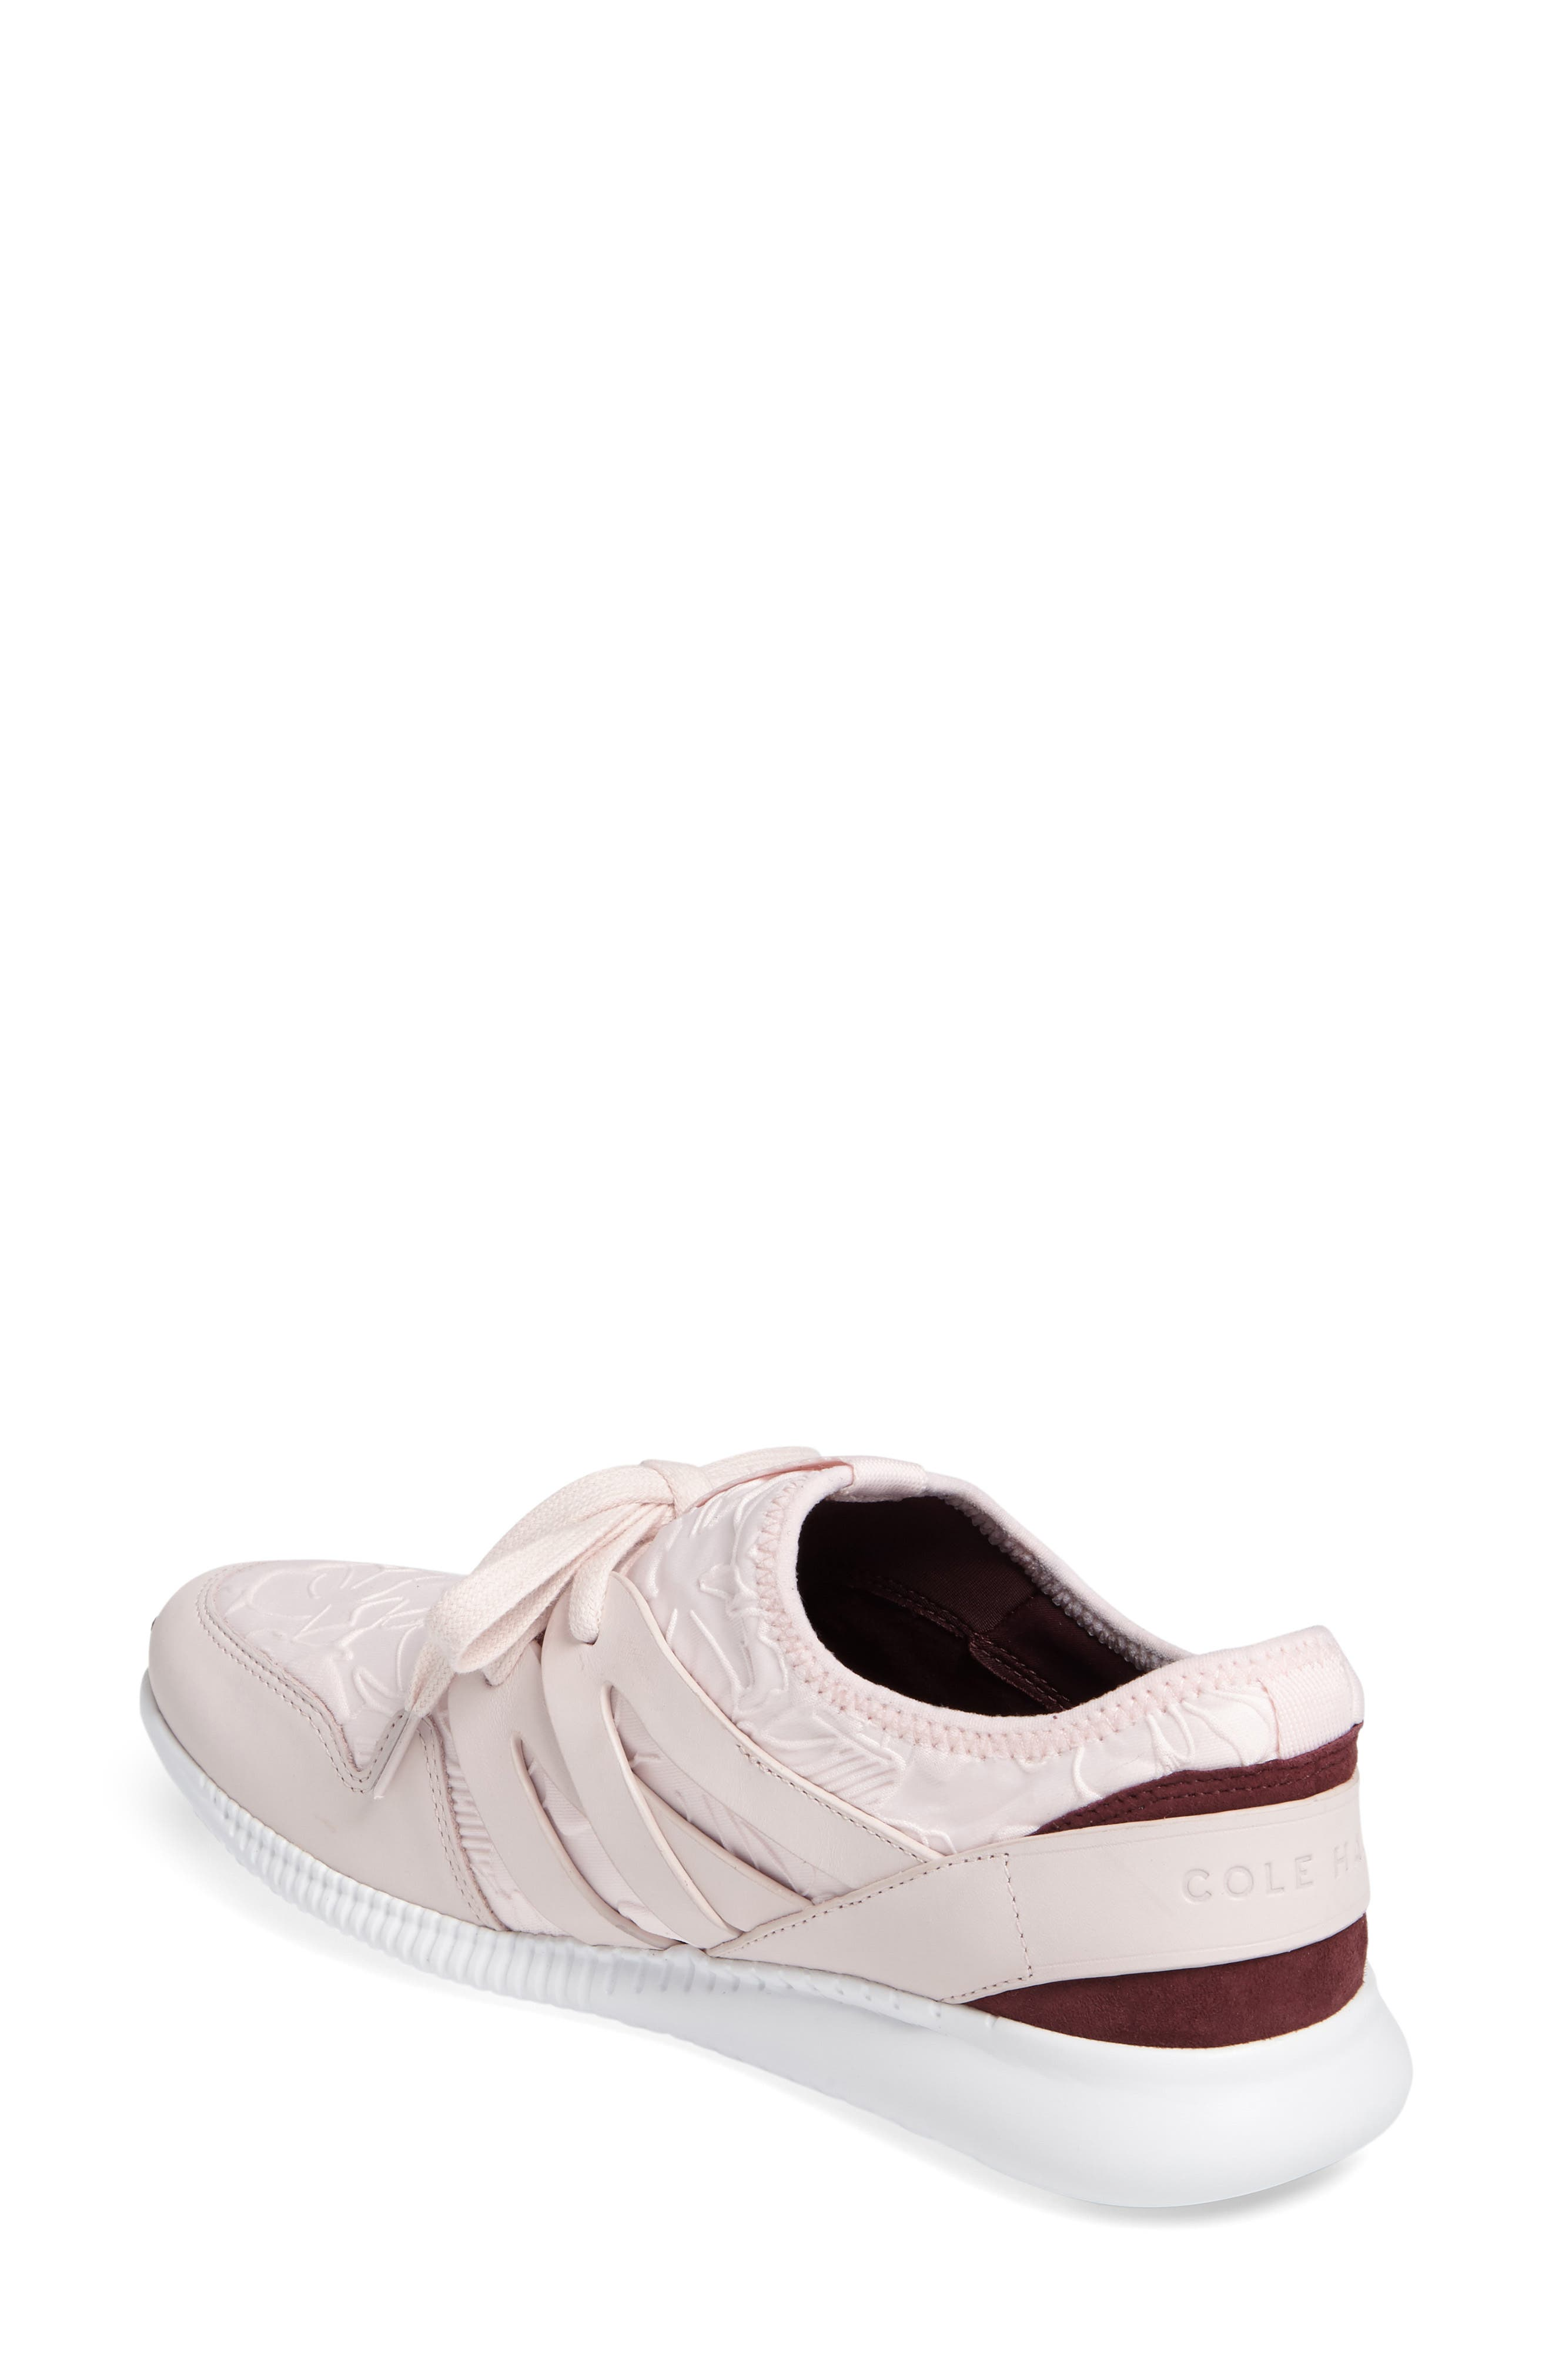 'StudioGrand' Sneaker,                             Alternate thumbnail 16, color,